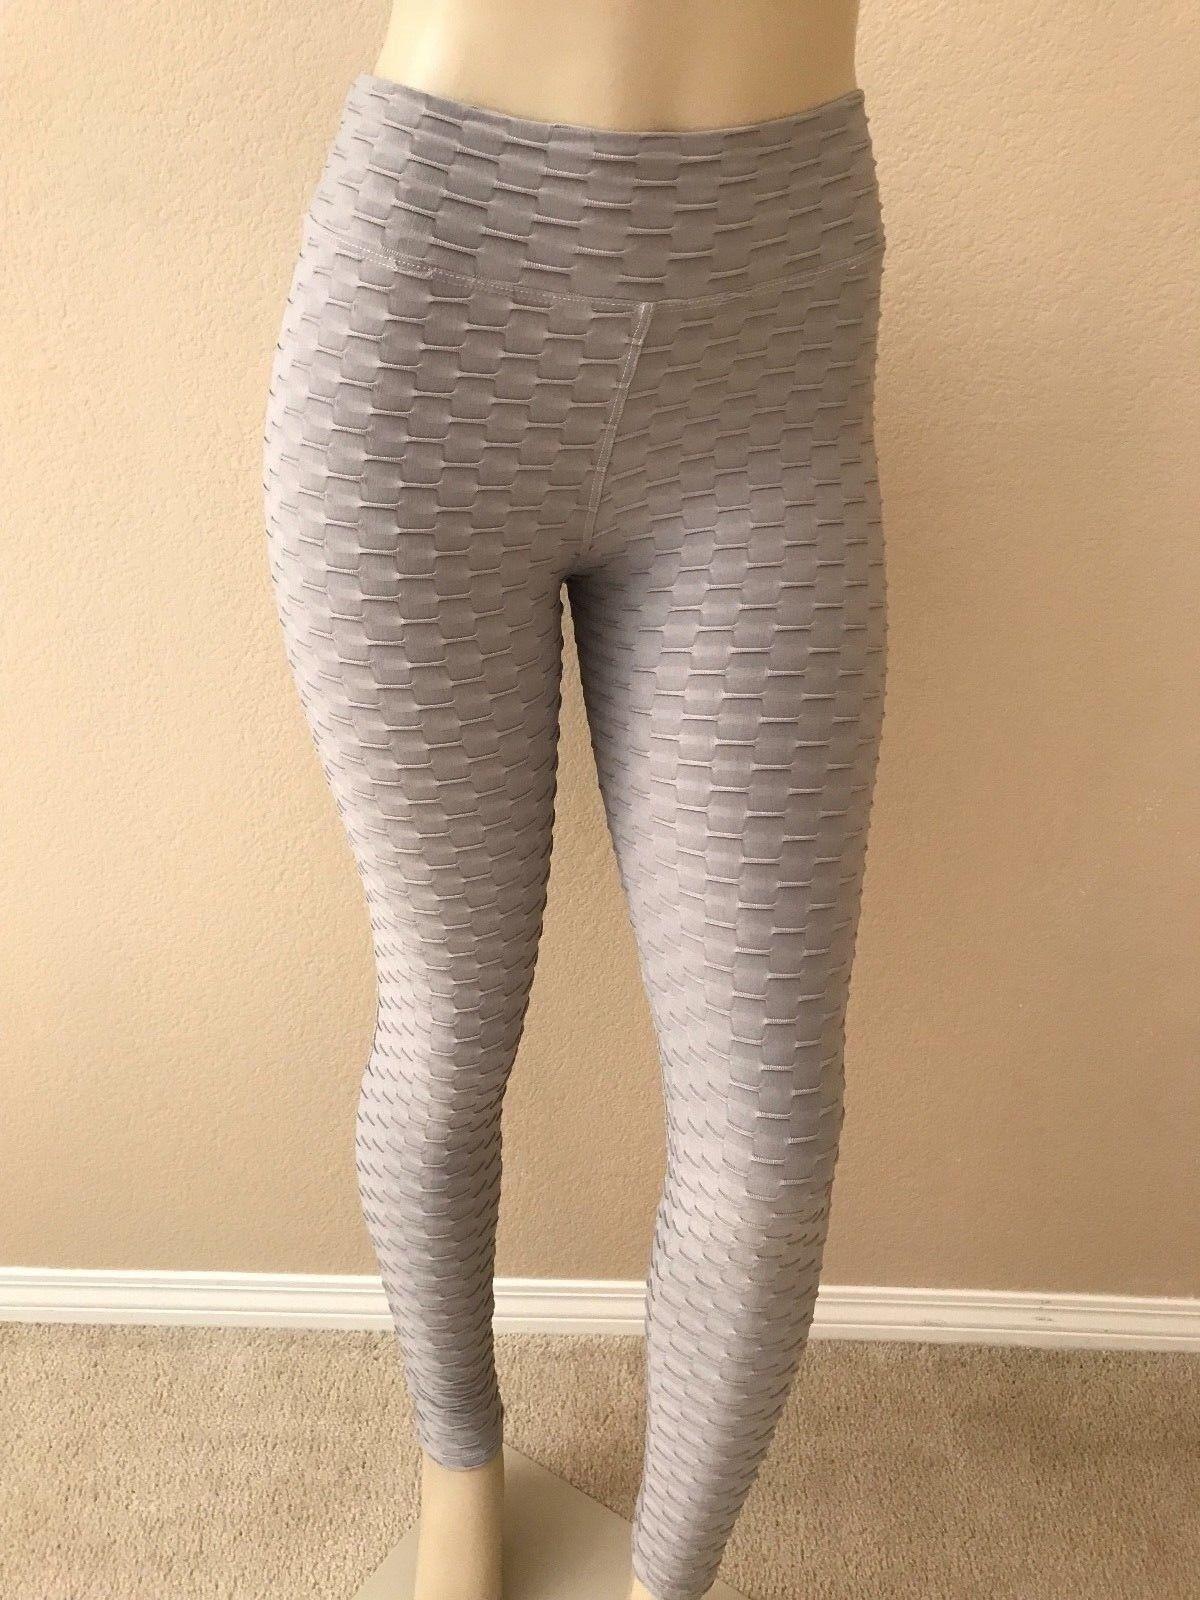 Yoga workout leggings- Brazilian High Waisted Texture Leggings